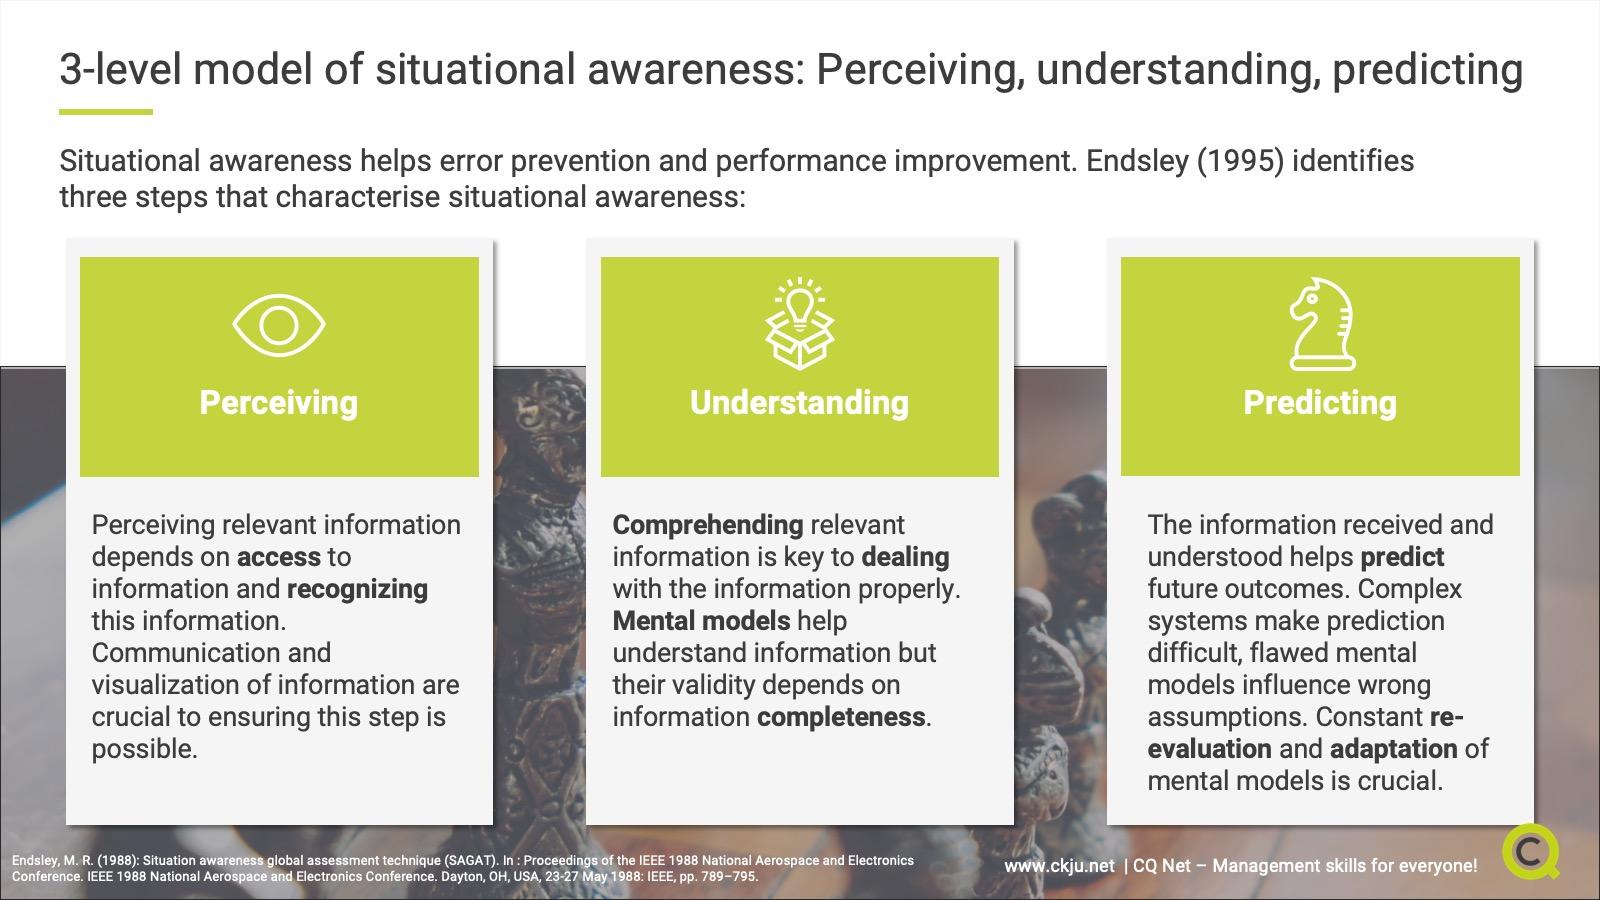 3-level model of situational awareness: Perceiving, understanding, predicting